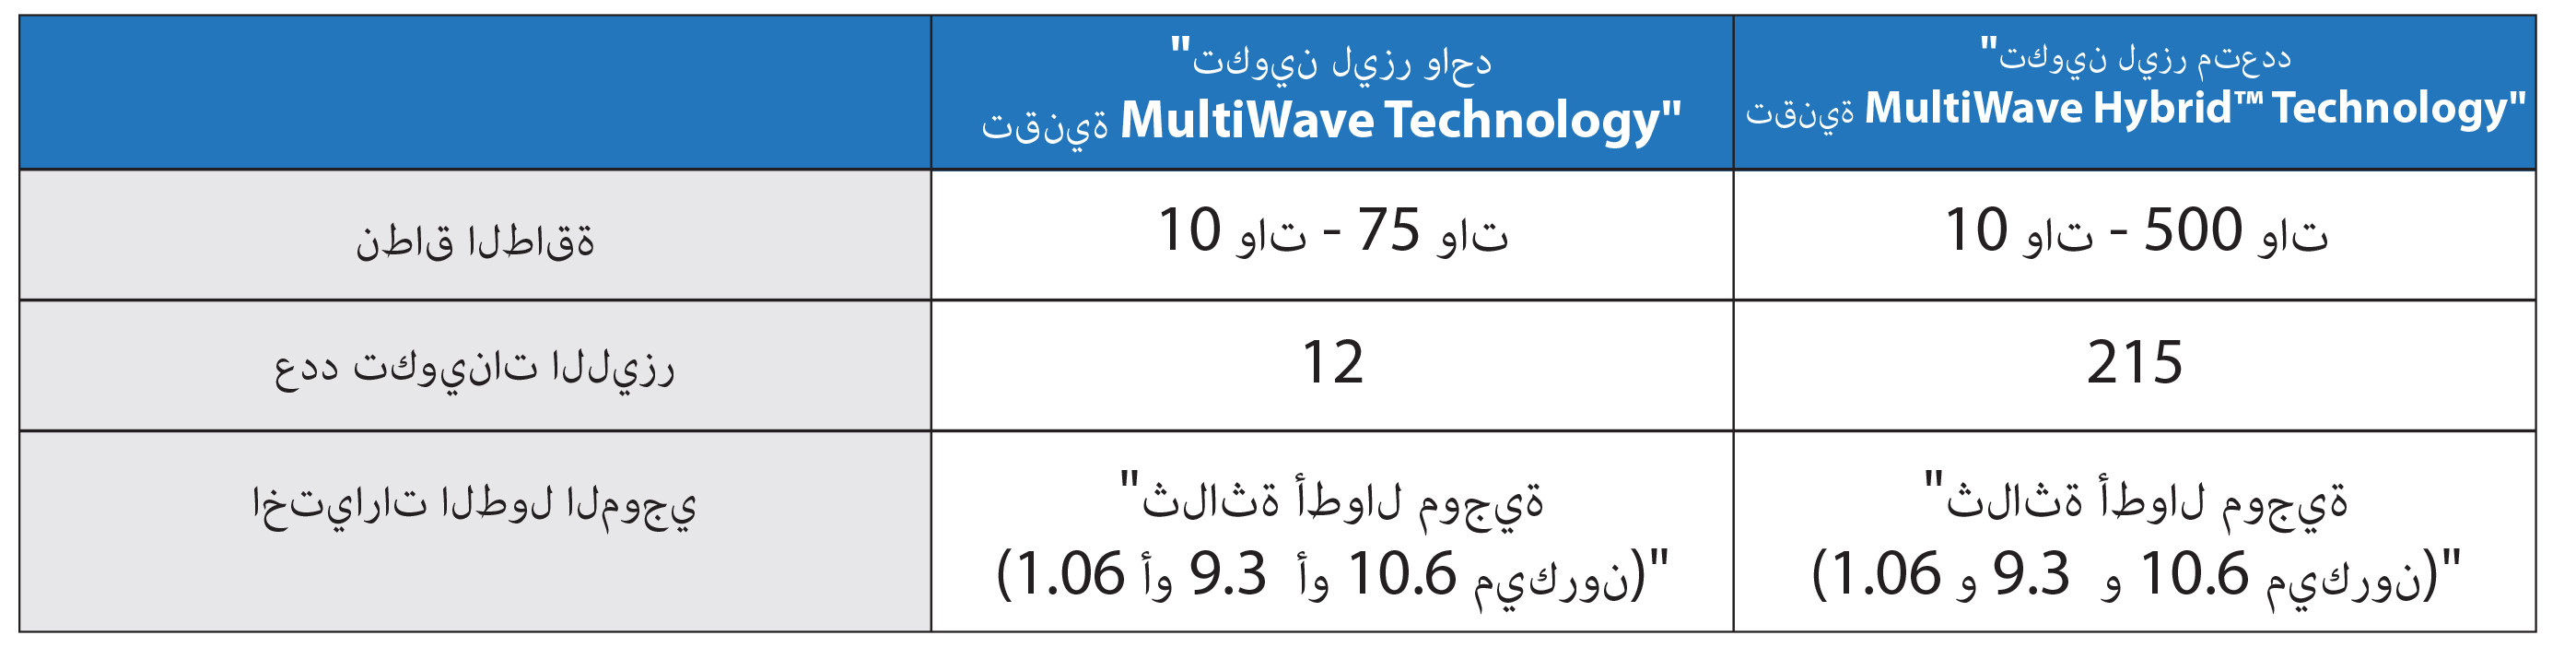 Single vs. Dual Laser MultiWave Hybrid™ Configurations